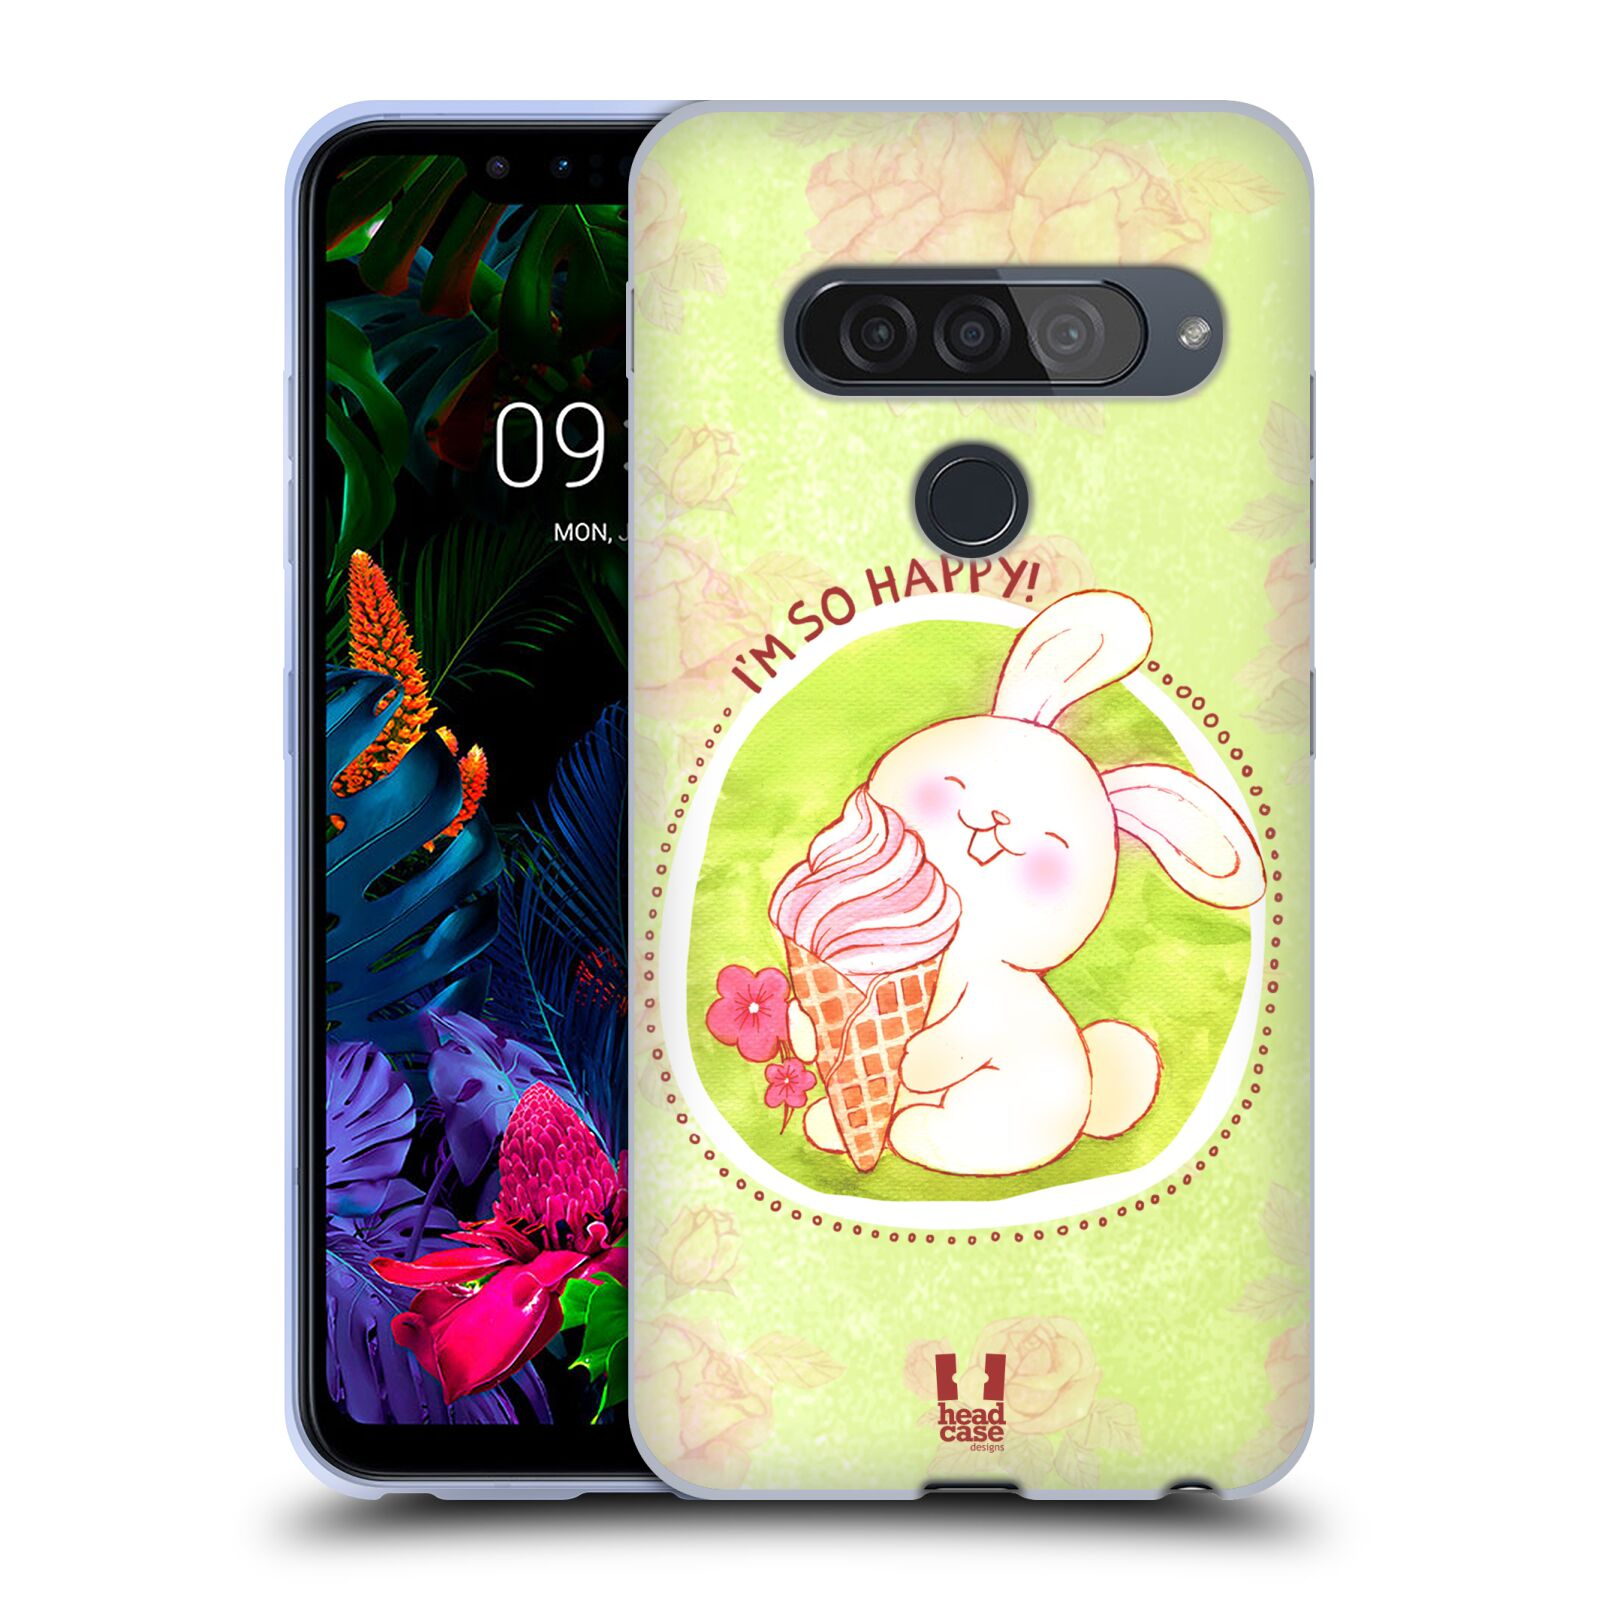 Silikonové pouzdro na mobil LG G8s ThinQ - Head Case - KRÁLÍČEK A ZMRZKA